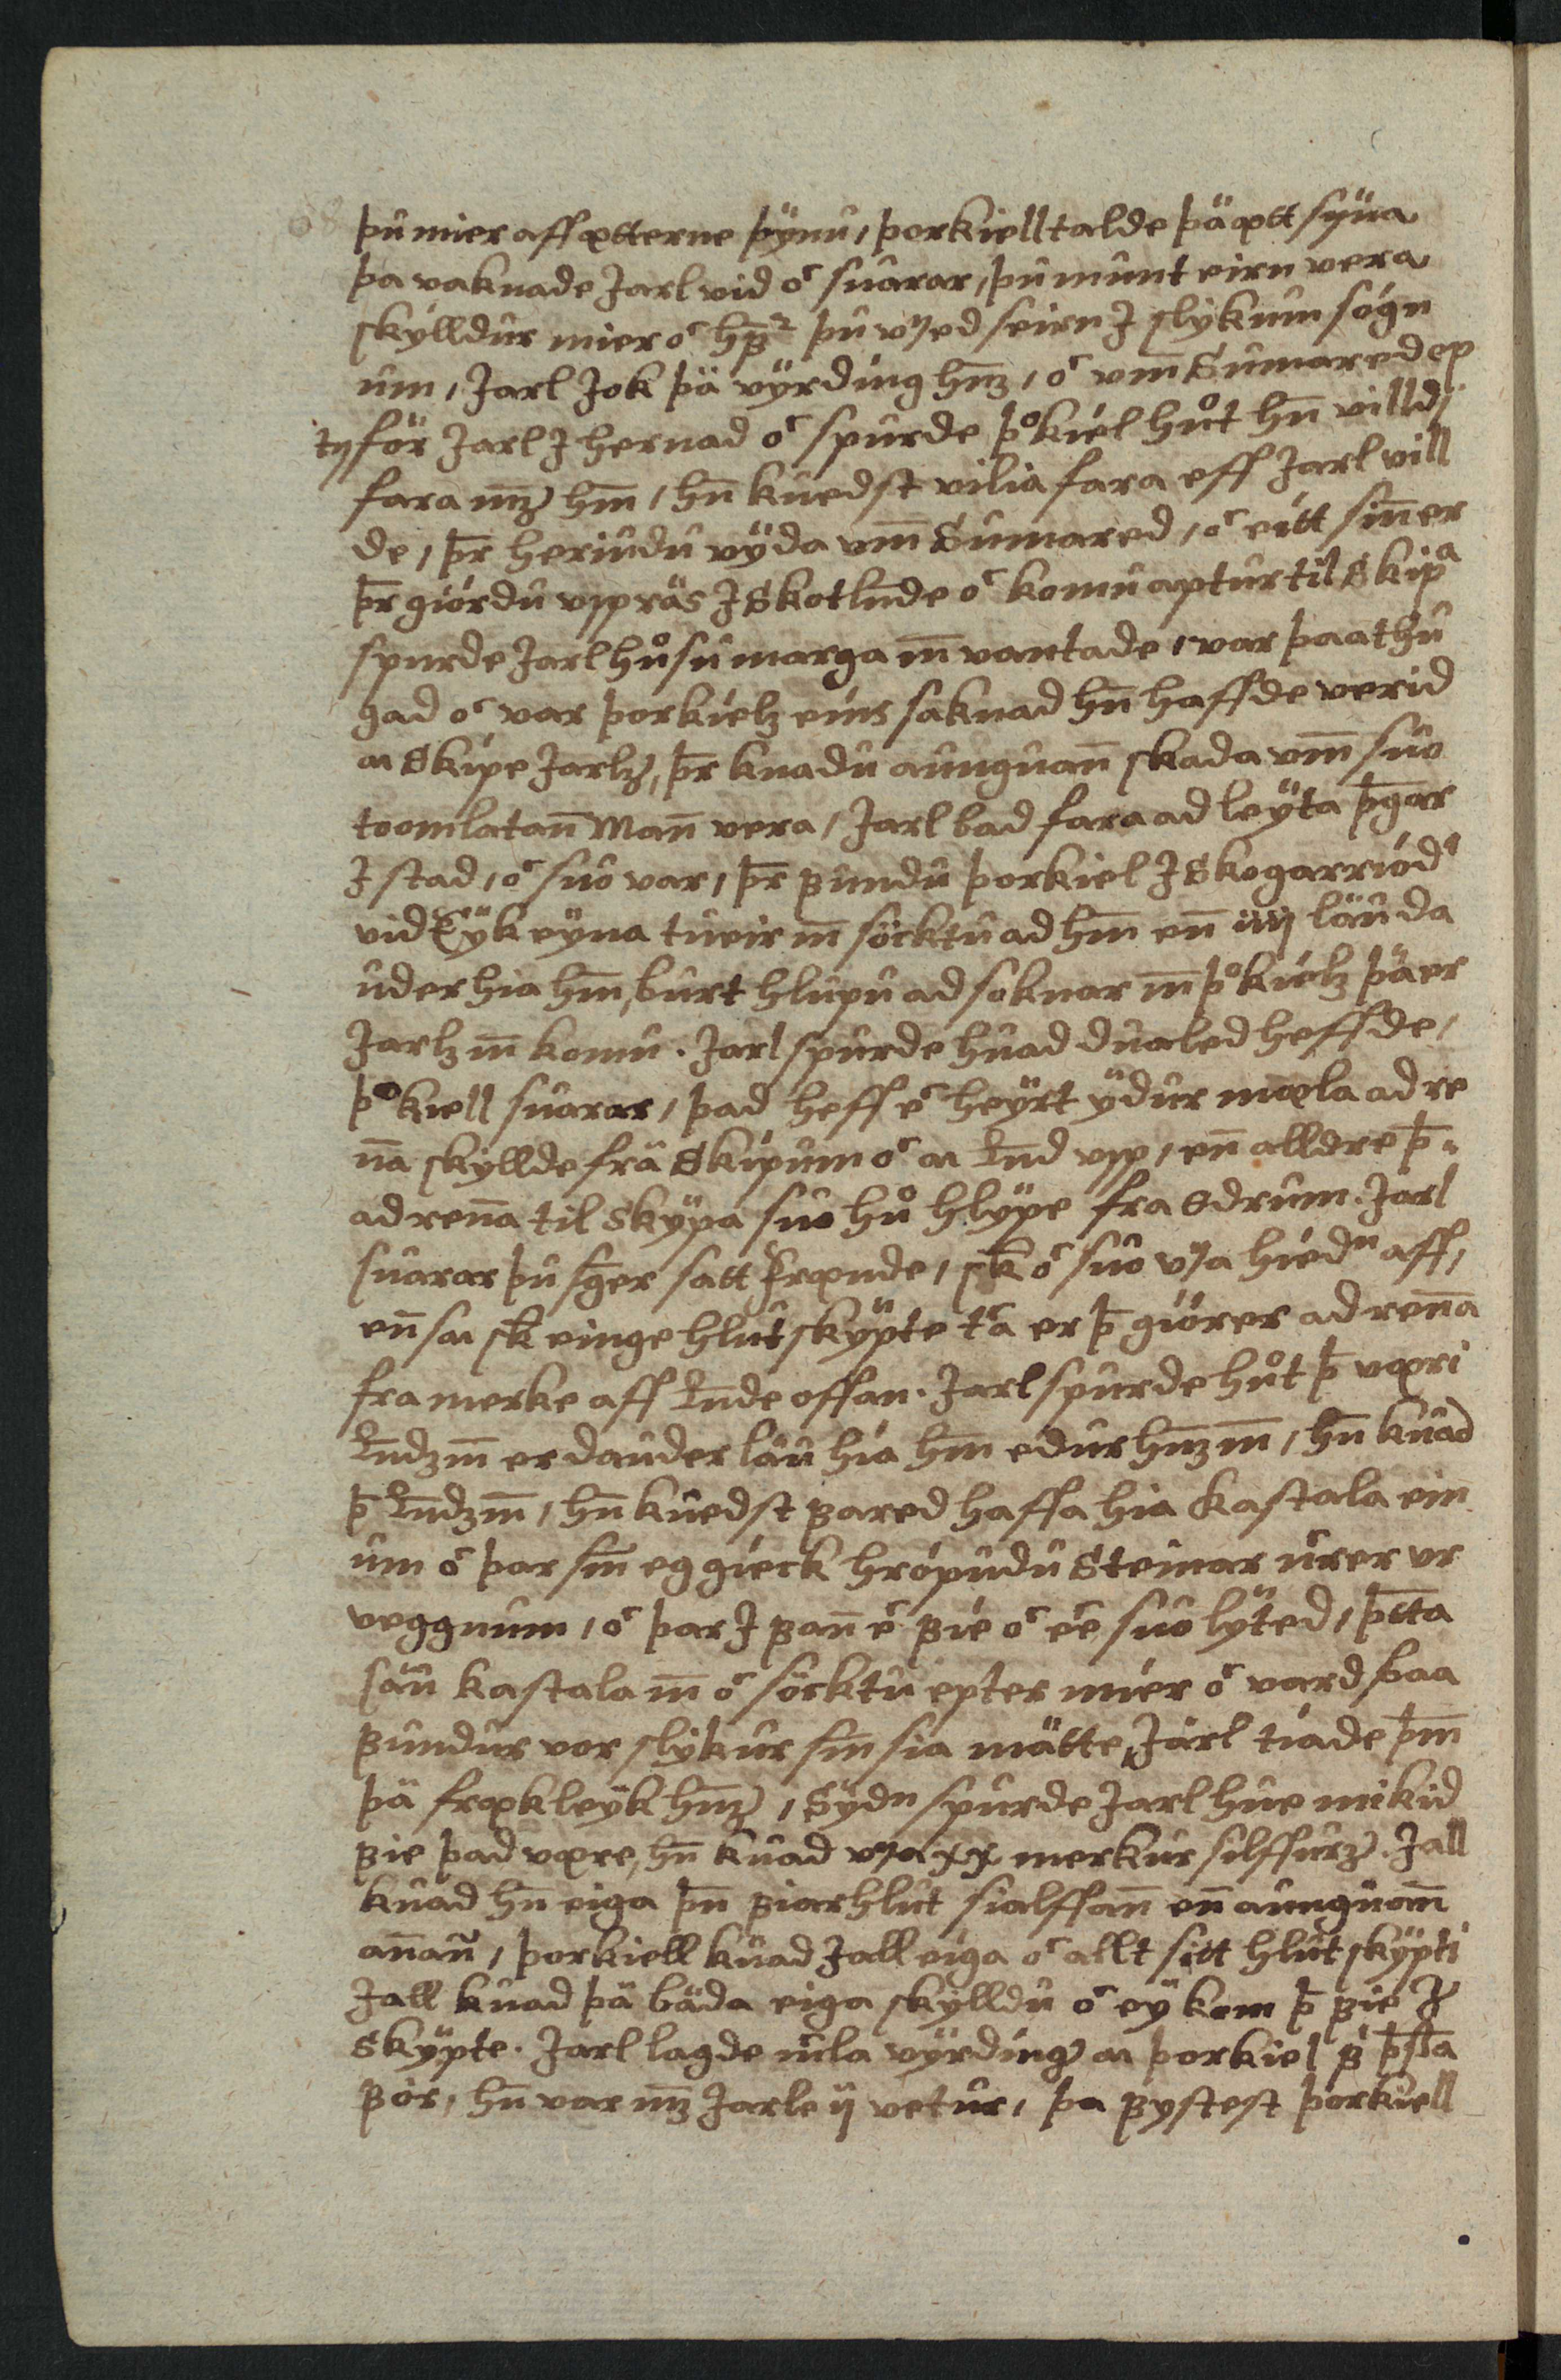 AM 138 fol - 34v